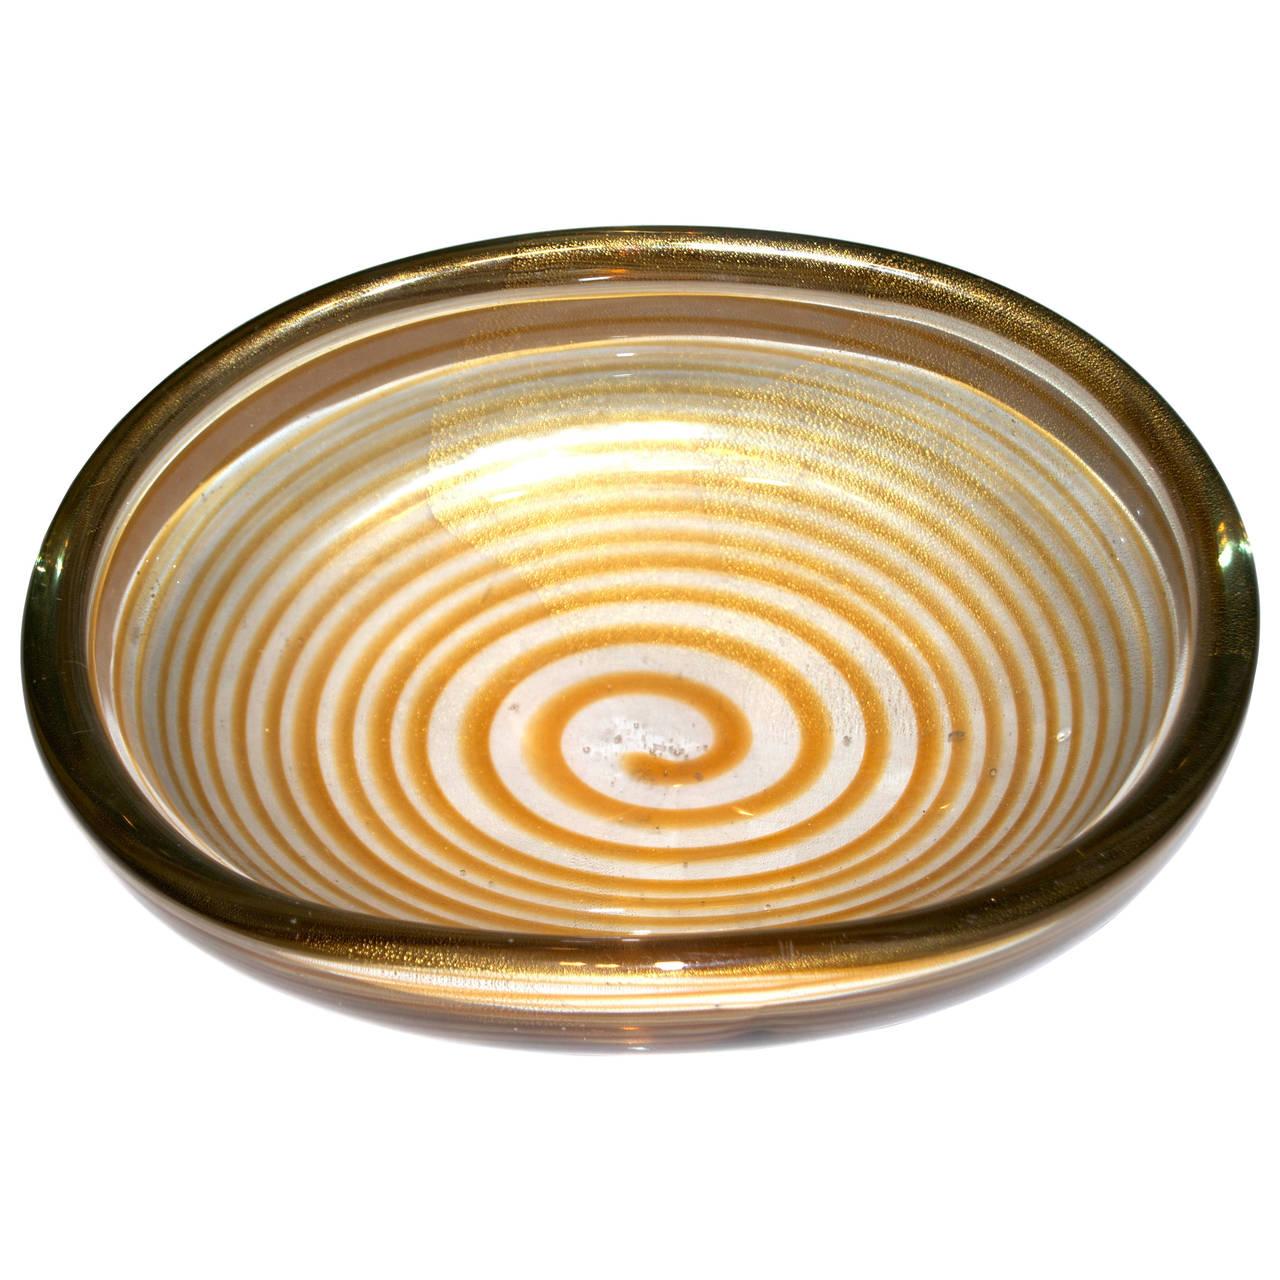 "Archimede Seguso  ""Spirale"" Centerpiece with Gold Inclusion POR"